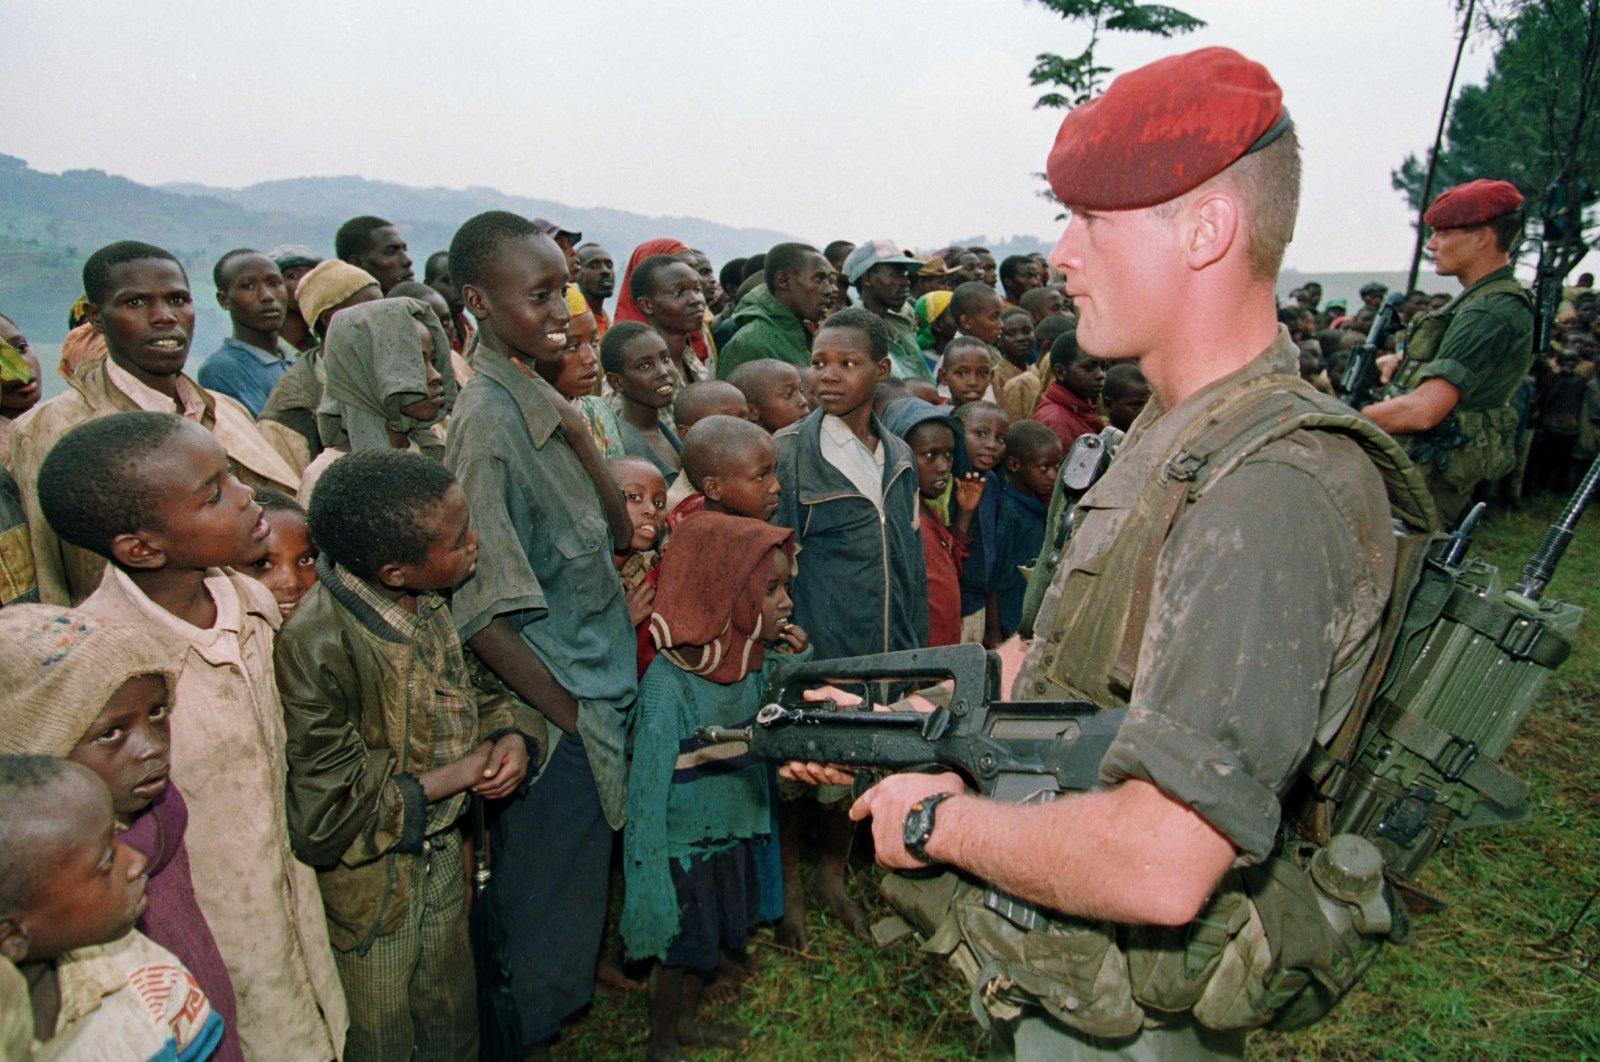 French soldiers stand guard at the Nyarushishi Tutsi refugee camp, Zaire border in Gisenyi, Rwanda, April 30, 1994. (AFP Photo)